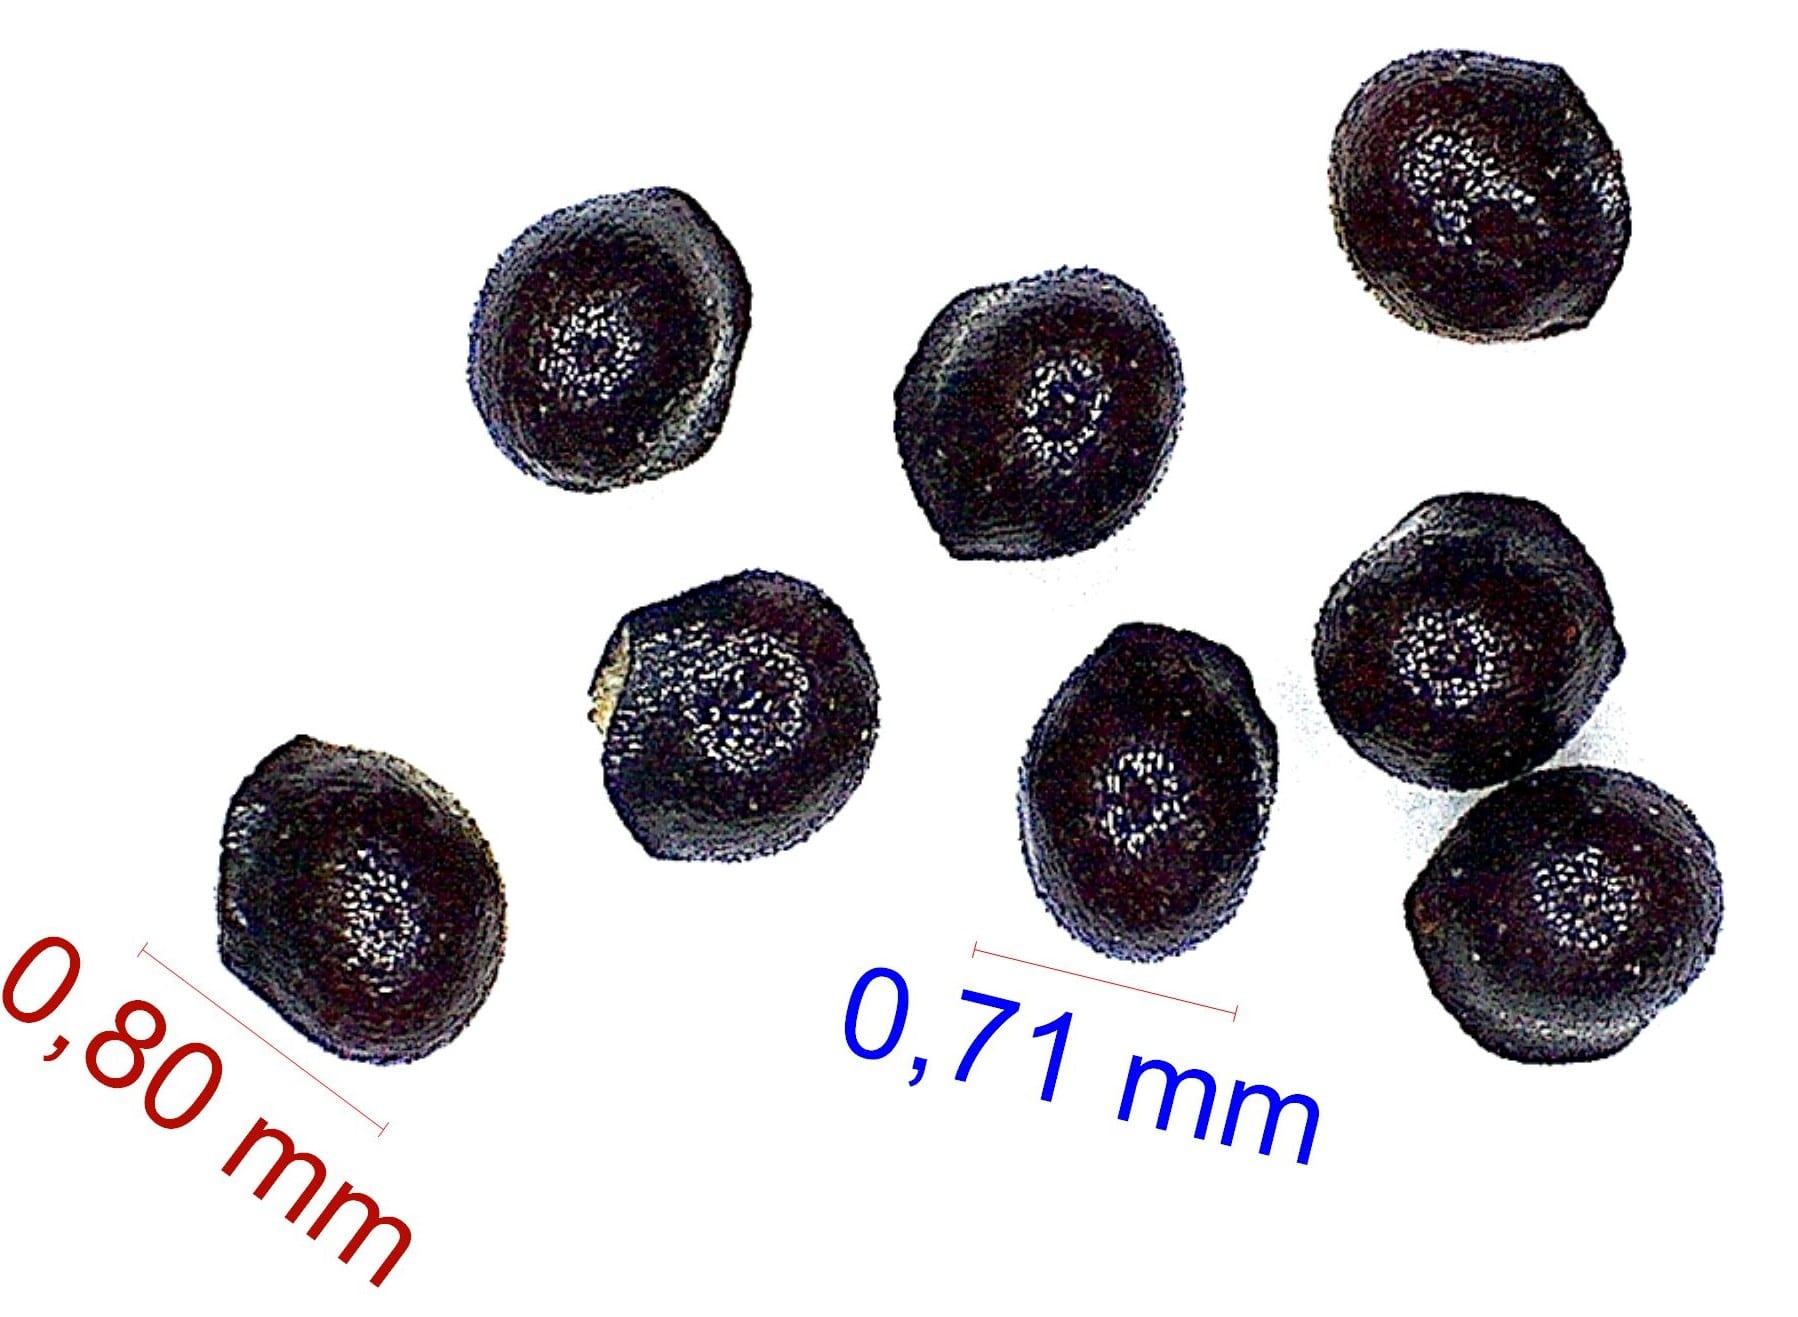 Gymnocalycium castellanosii. © Joël Lodé/cactus-aventures.com